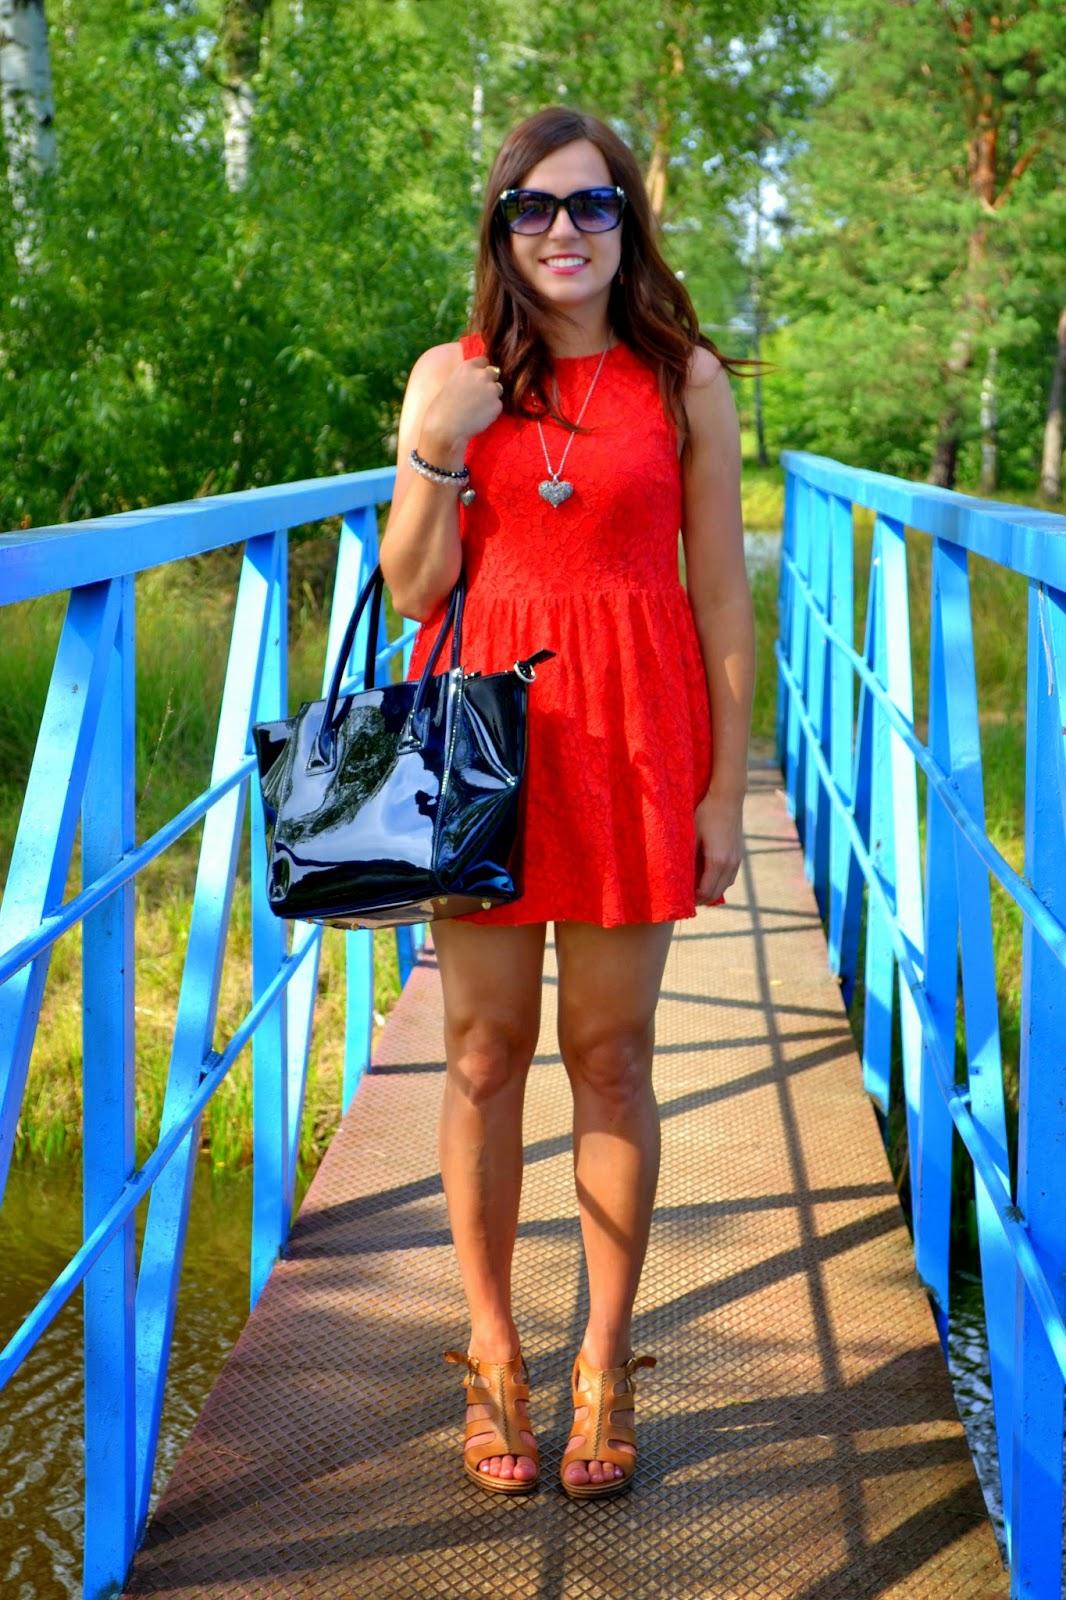 czerwona sukienka, koronkowa sukienka, seksowne sukienki